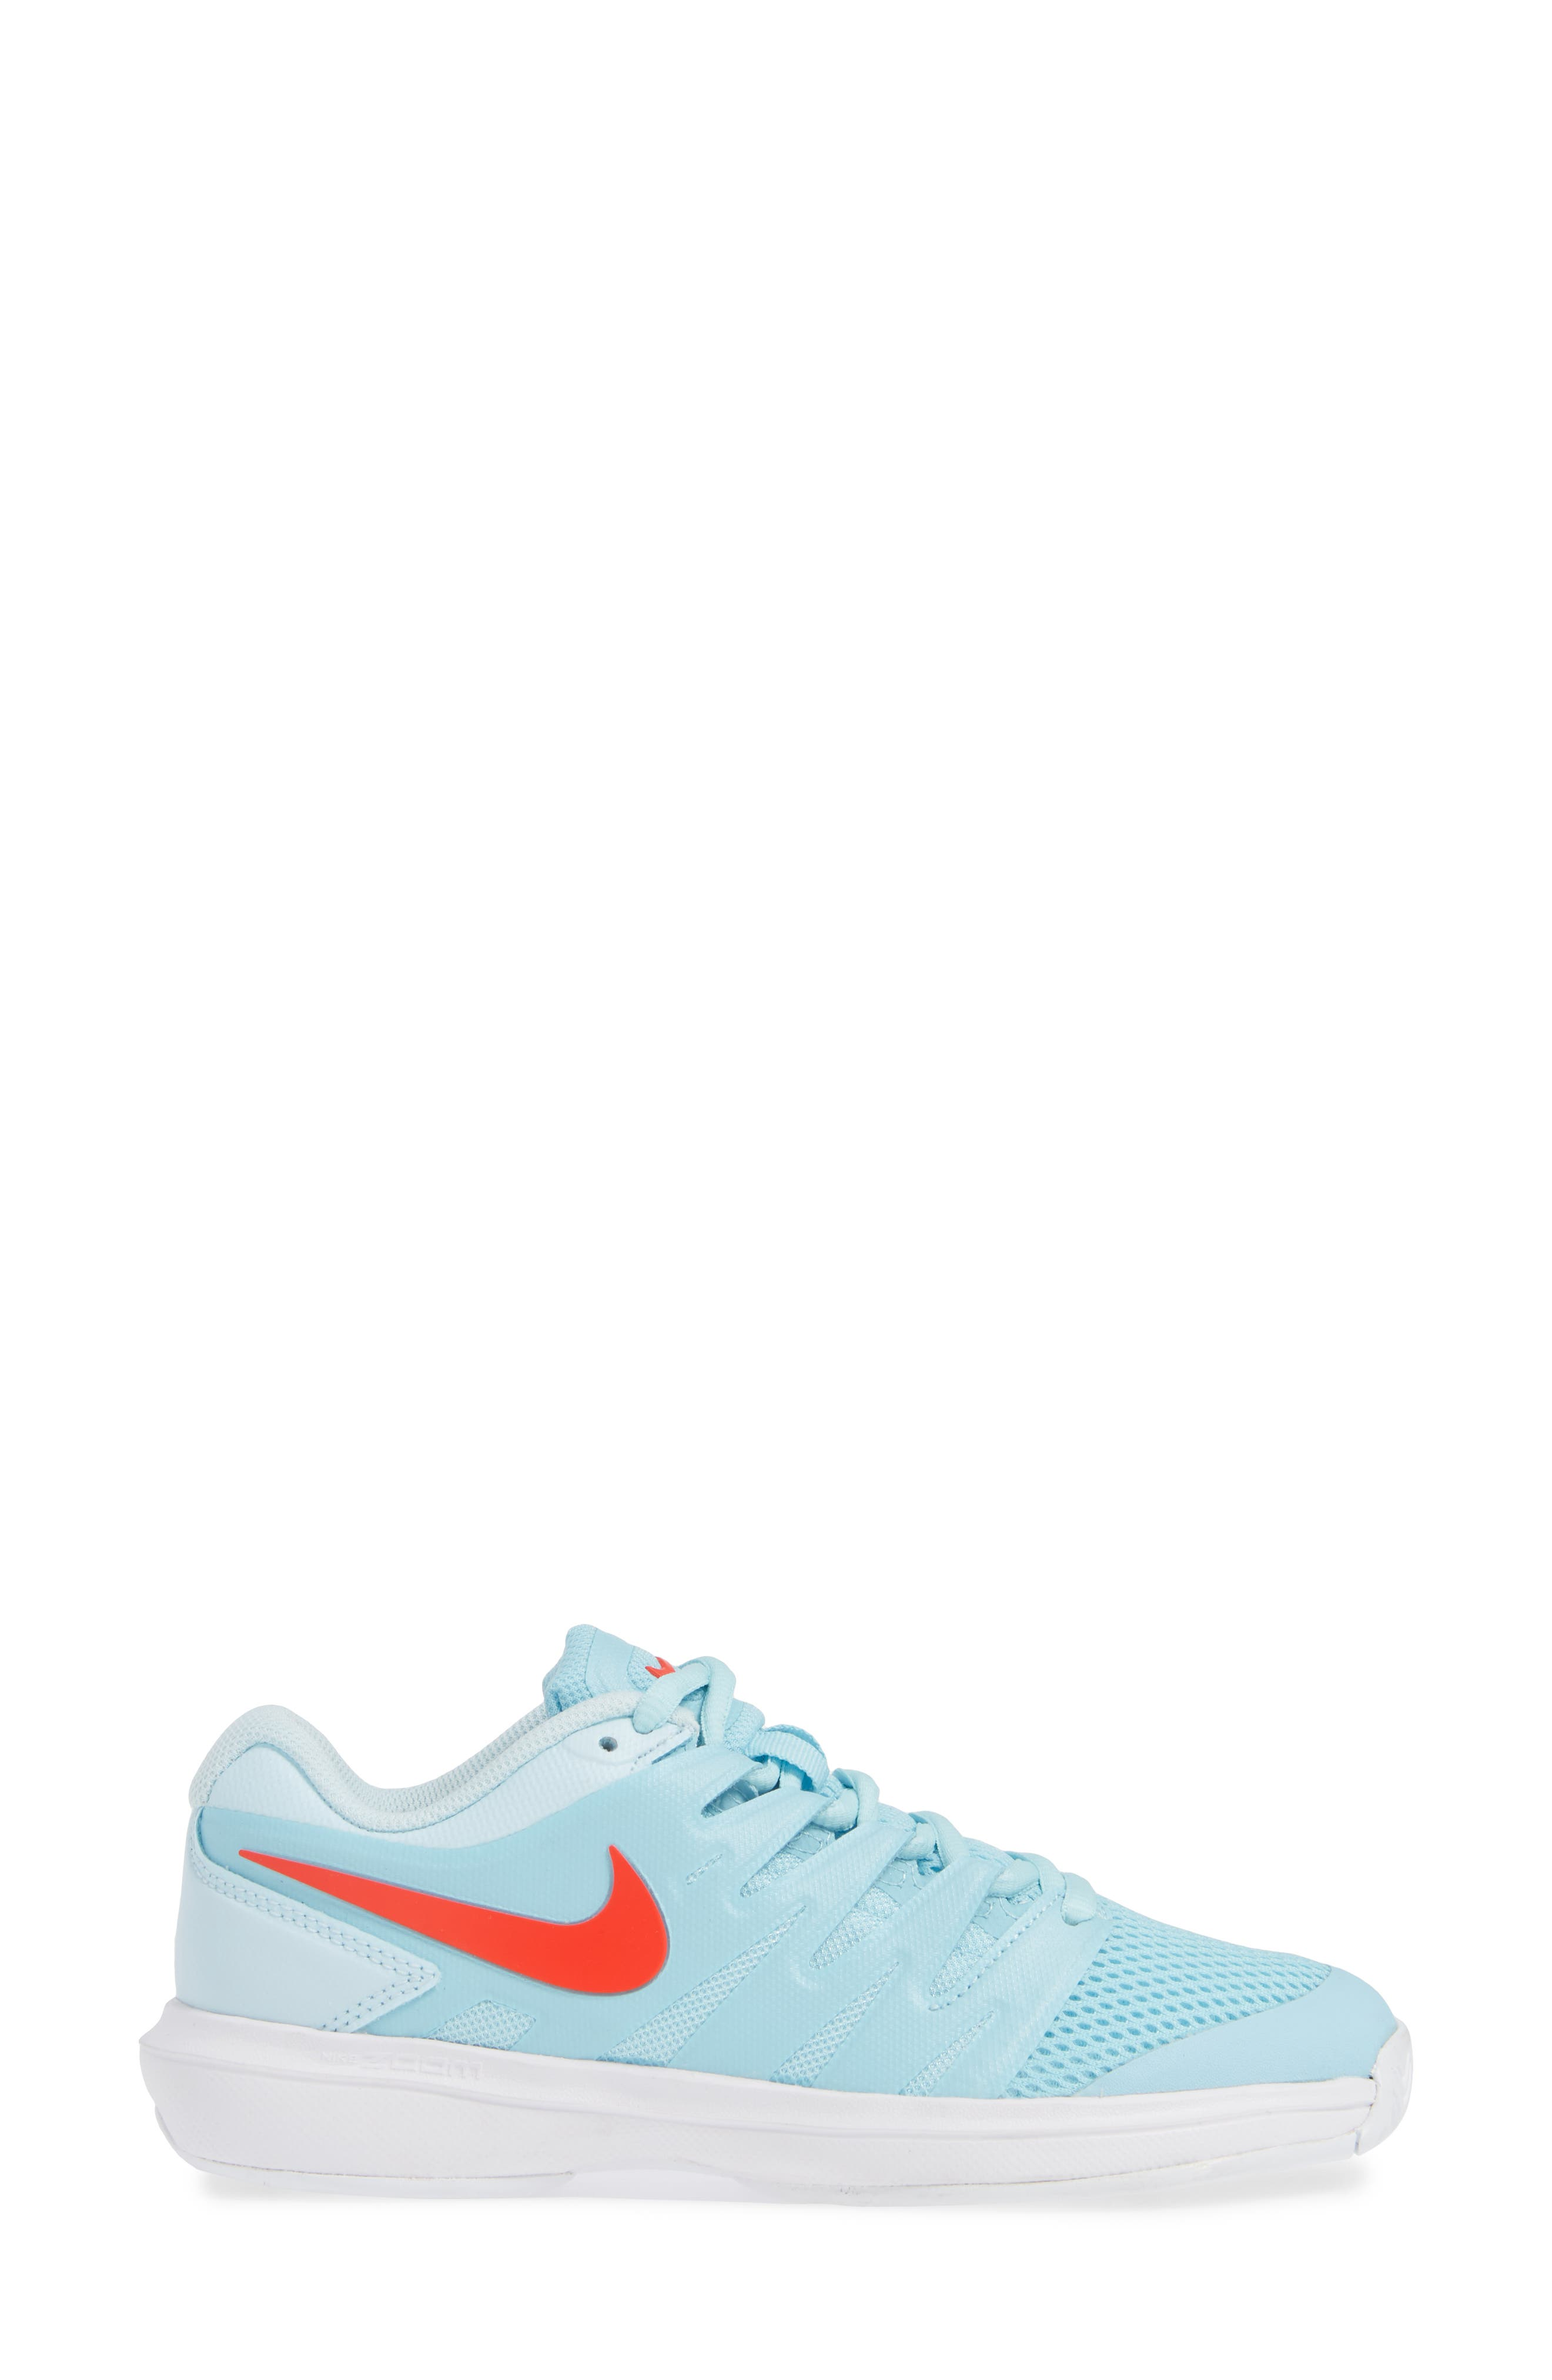 Air Zoom Prestige Tennis Shoe,                             Alternate thumbnail 3, color,                             BLUE/ BRIGHT CRIMSON-TOPAZ